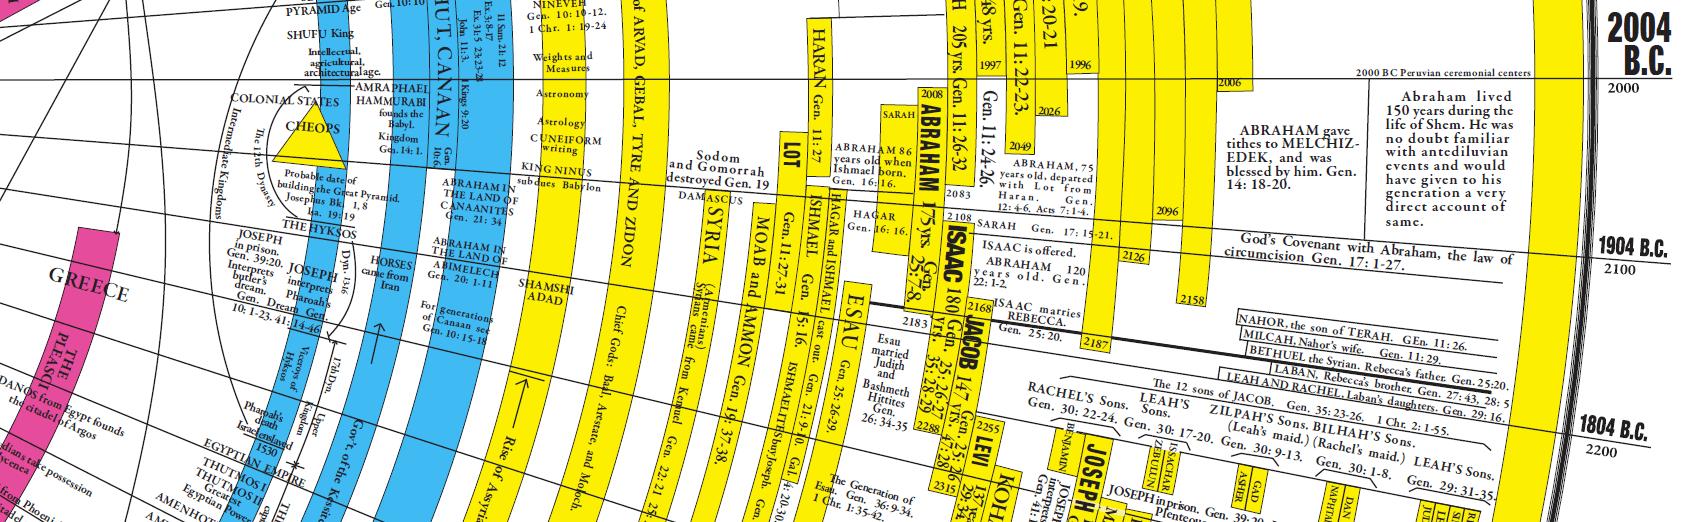 Bible World Timeline Wiring Diagrams Diagram Of Yamaha Atv Parts 1987 Moto4 Yfm200dxt Electrical 1 Amazing With Bonuses Rh Amazingbibletimeline Com History Old Testament